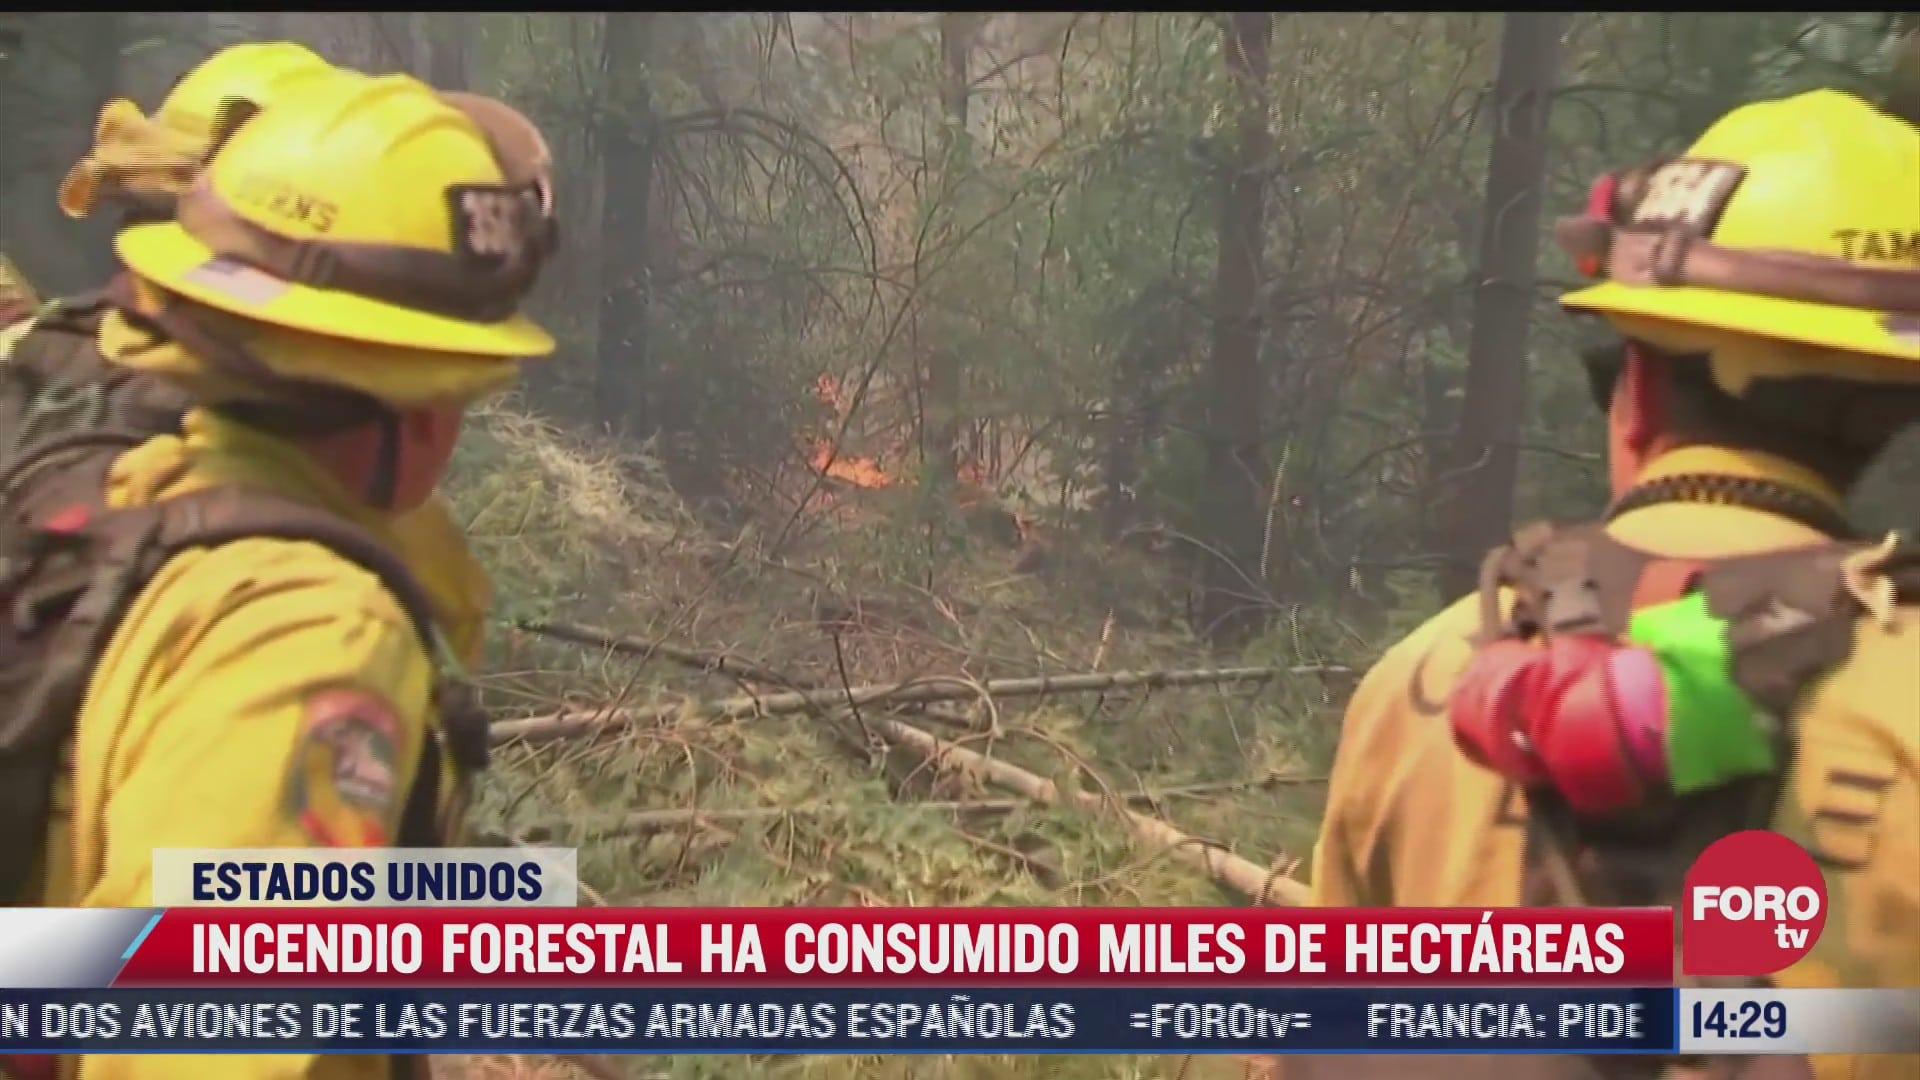 incendio forestal en california ha consumido miles de hectareas